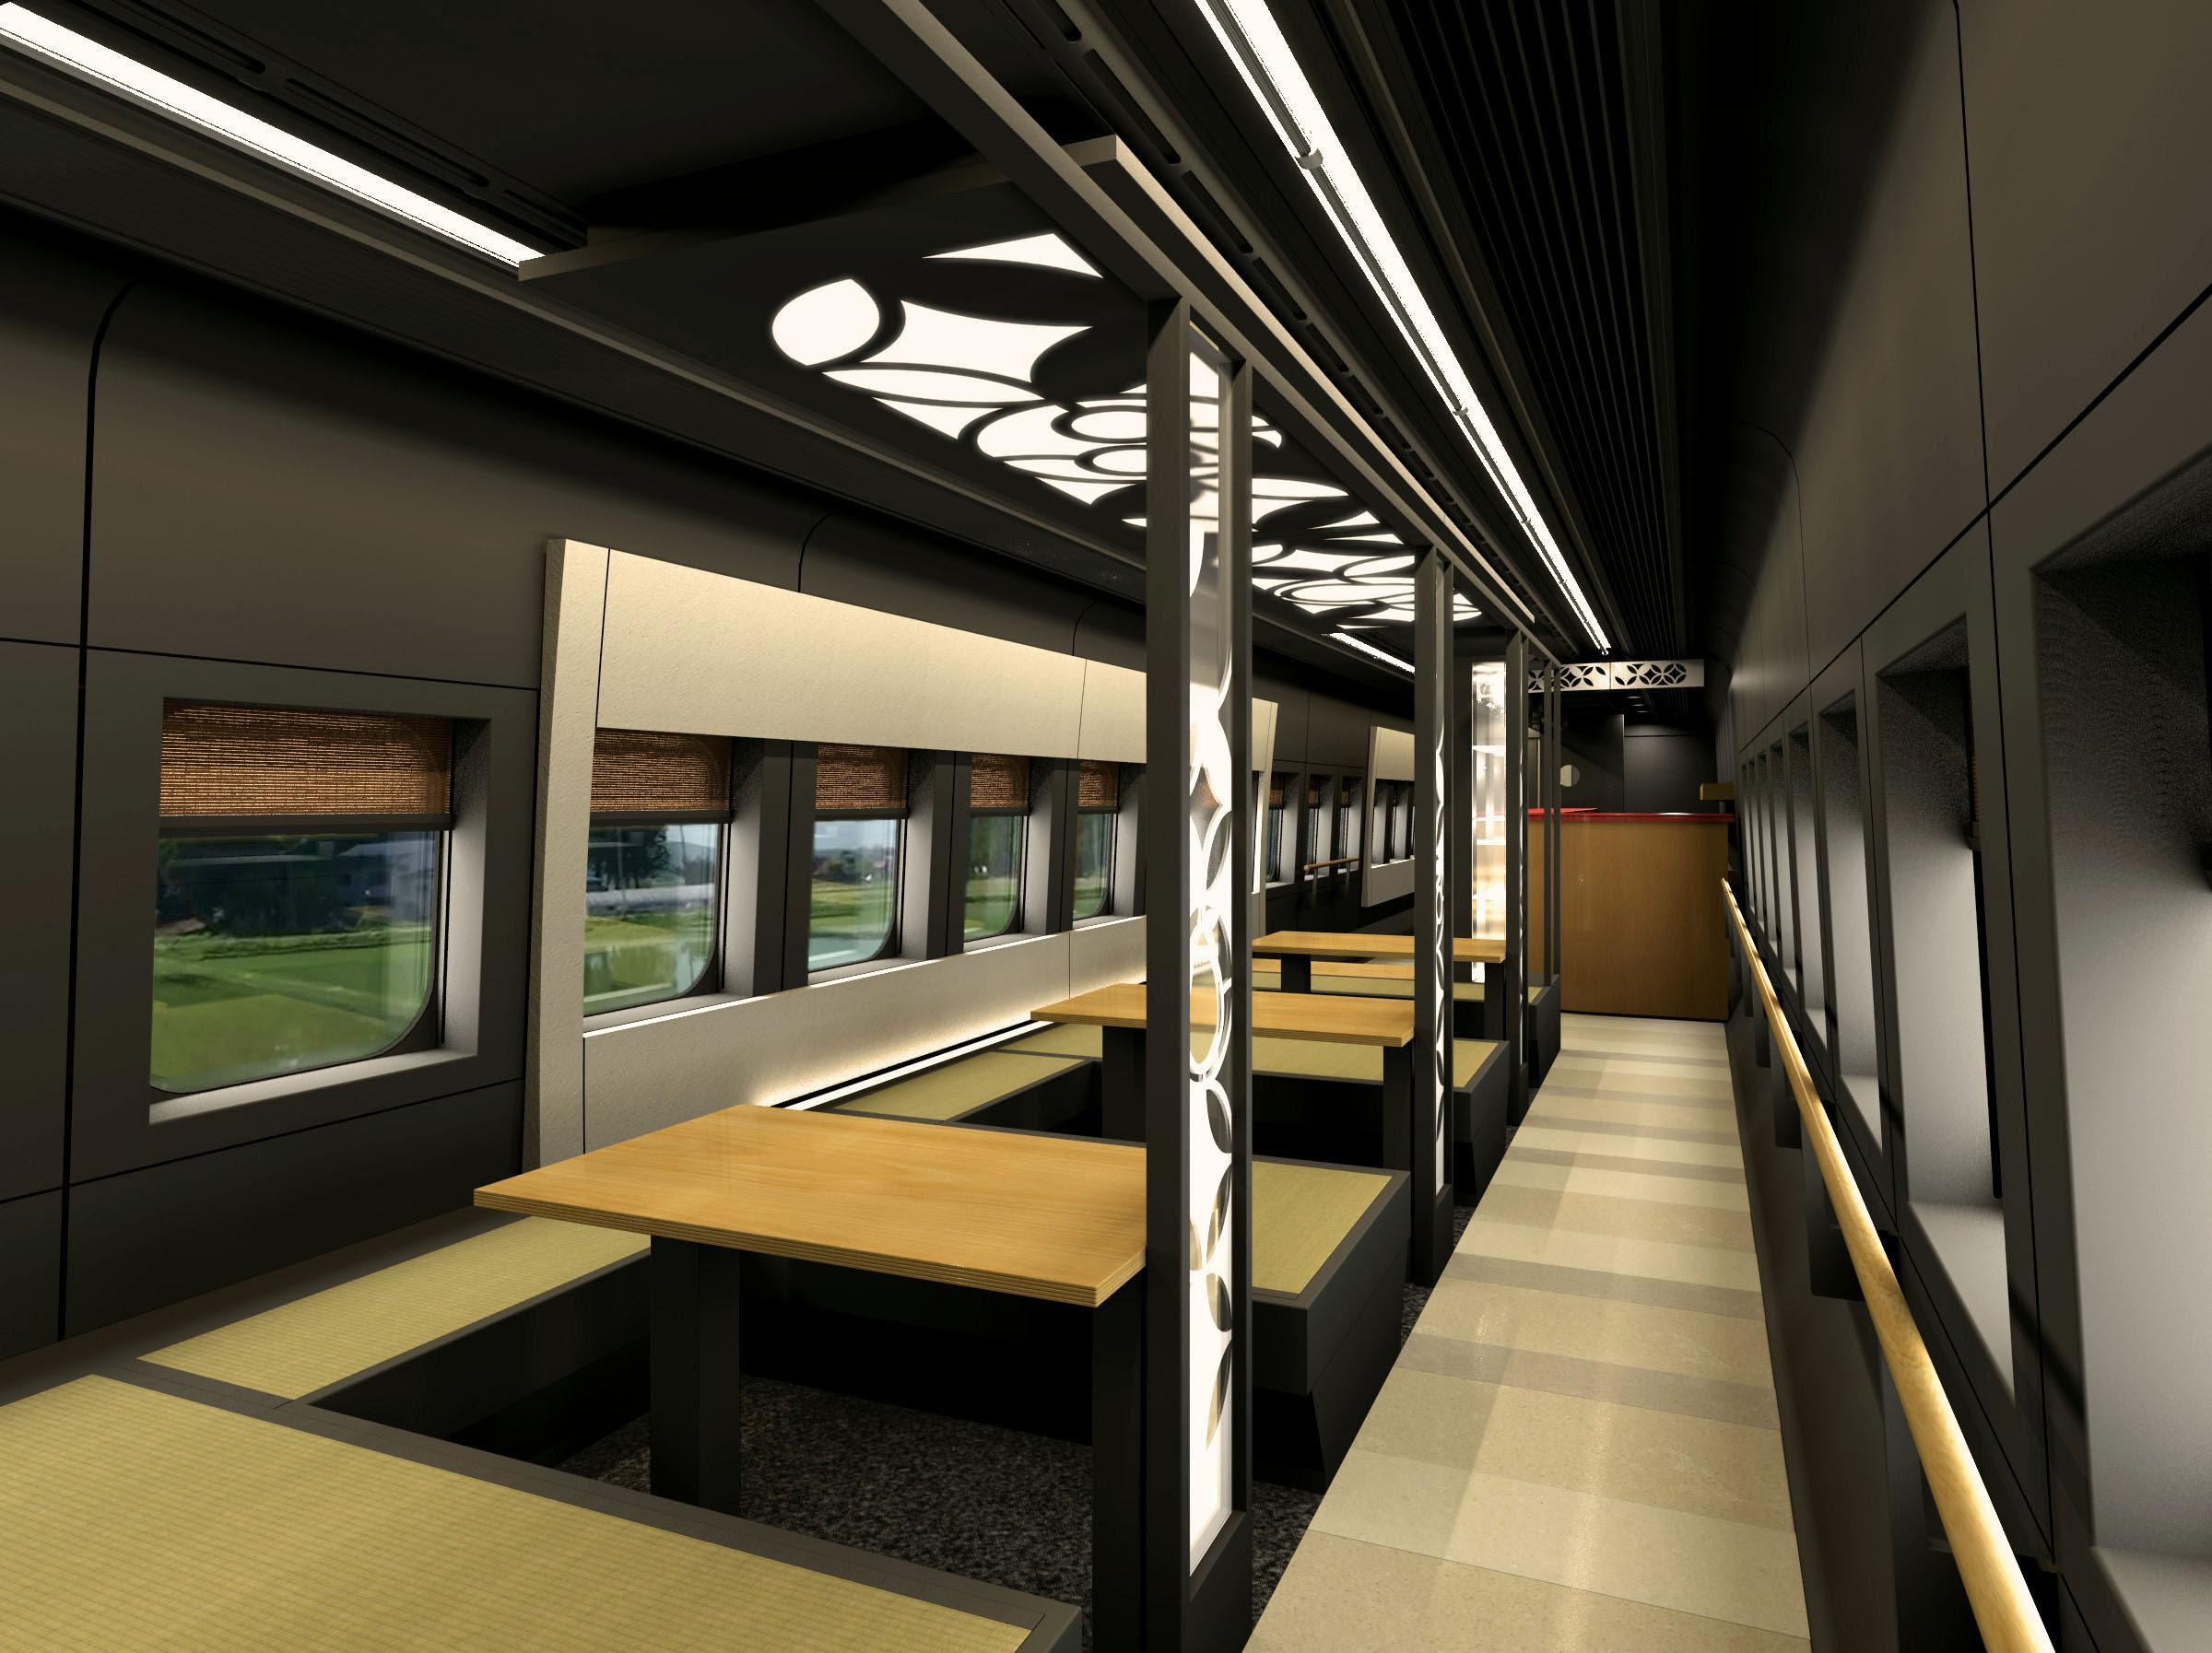 Yamagata bullet train to get foot baths, tatami   The ...